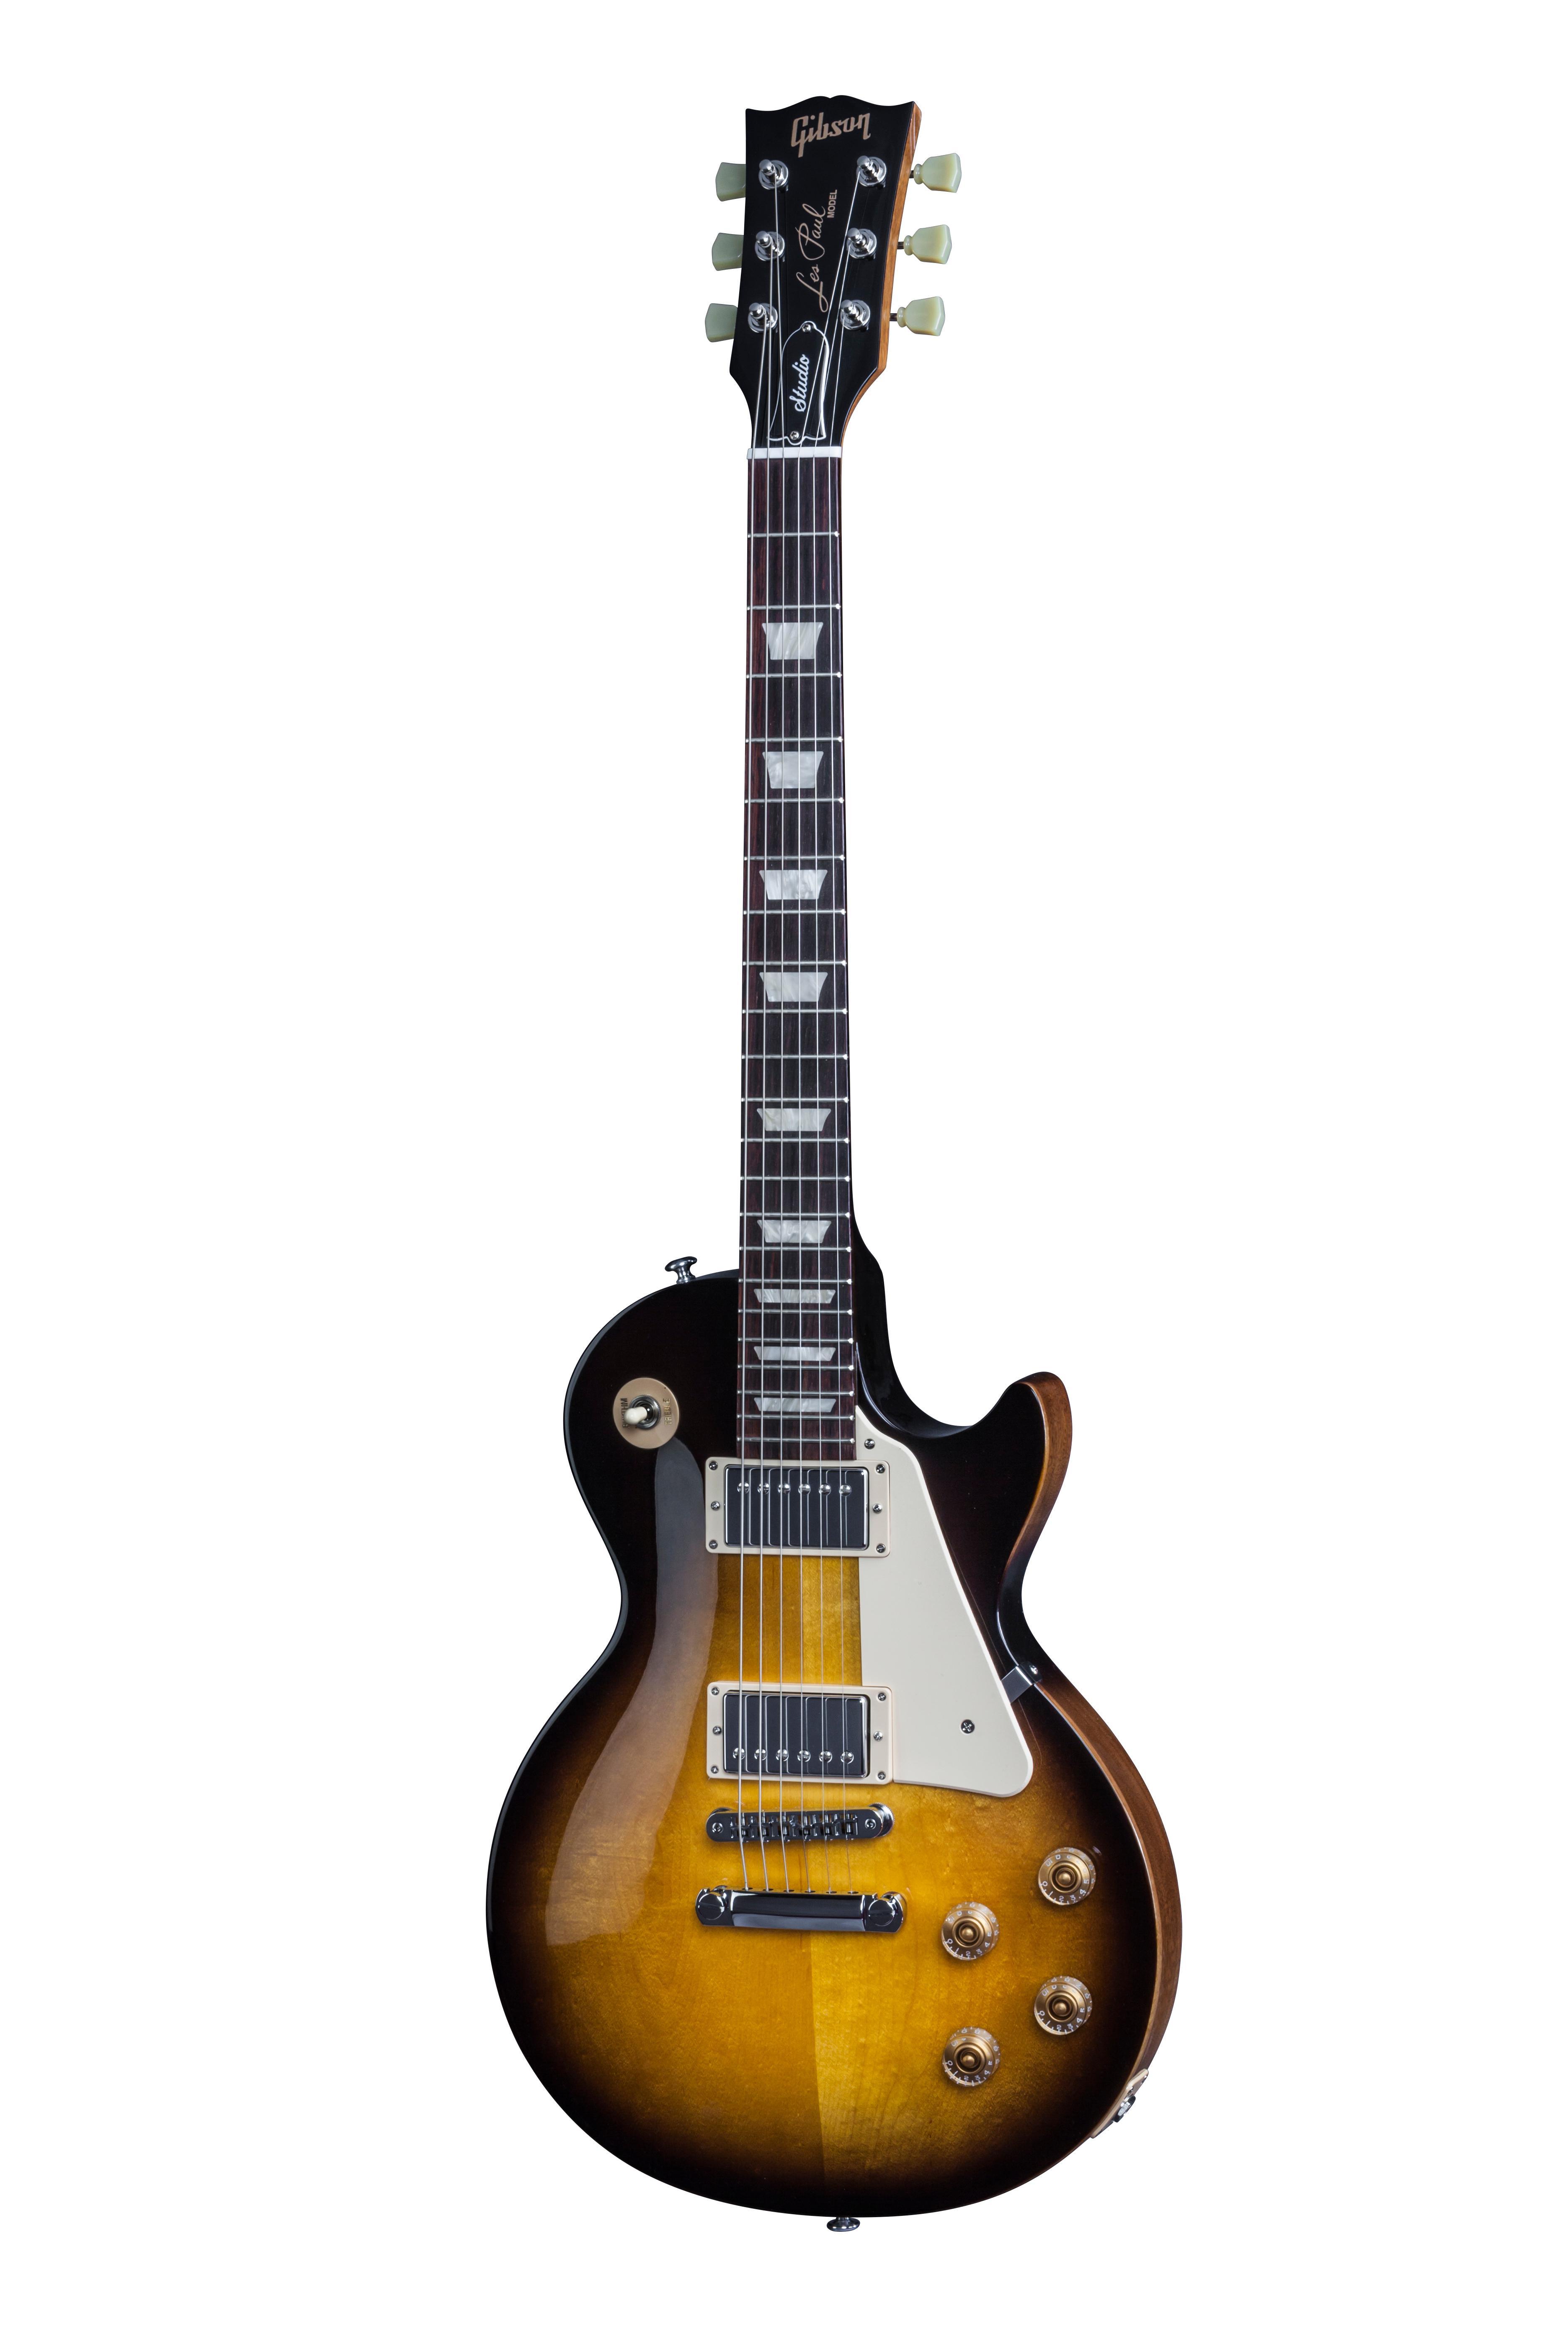 gibson usa les paul studio 2016 t electric guitar vintage sunburst musical. Black Bedroom Furniture Sets. Home Design Ideas